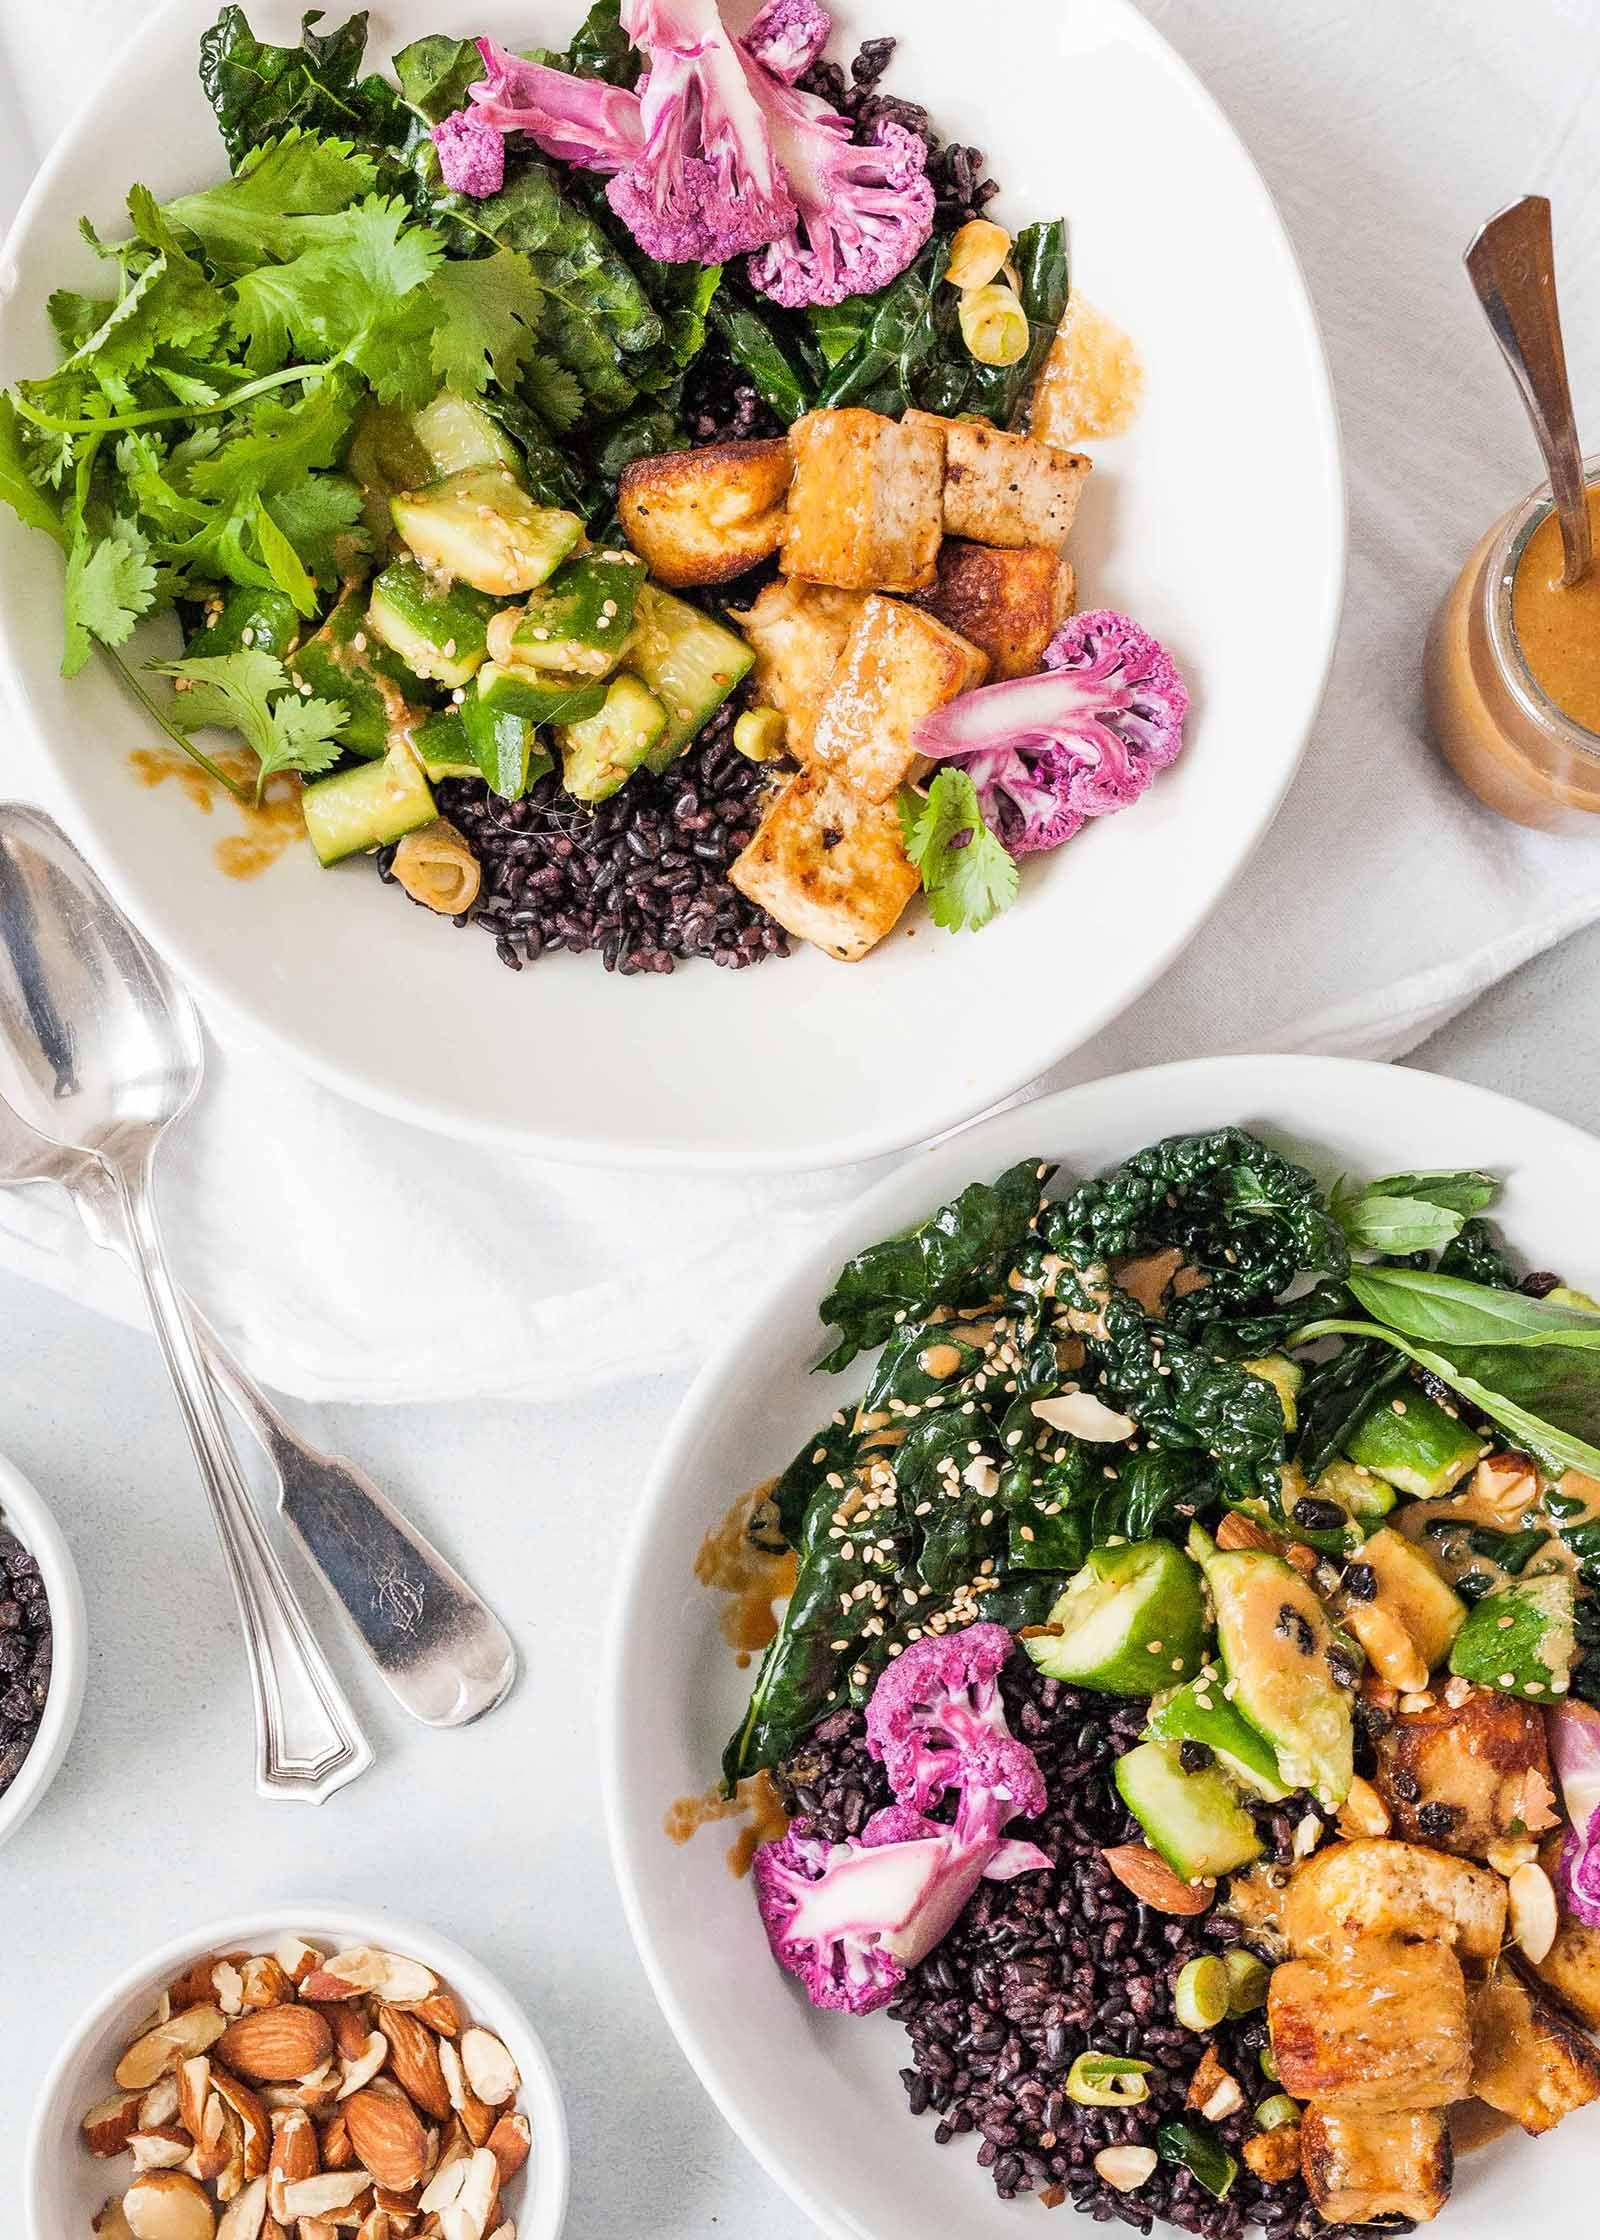 Black Rice Bowls With Tofu And Veggies Recipe Simplyrecipes Com Recipe Recipes Veggie Recipes Cooking Tofu